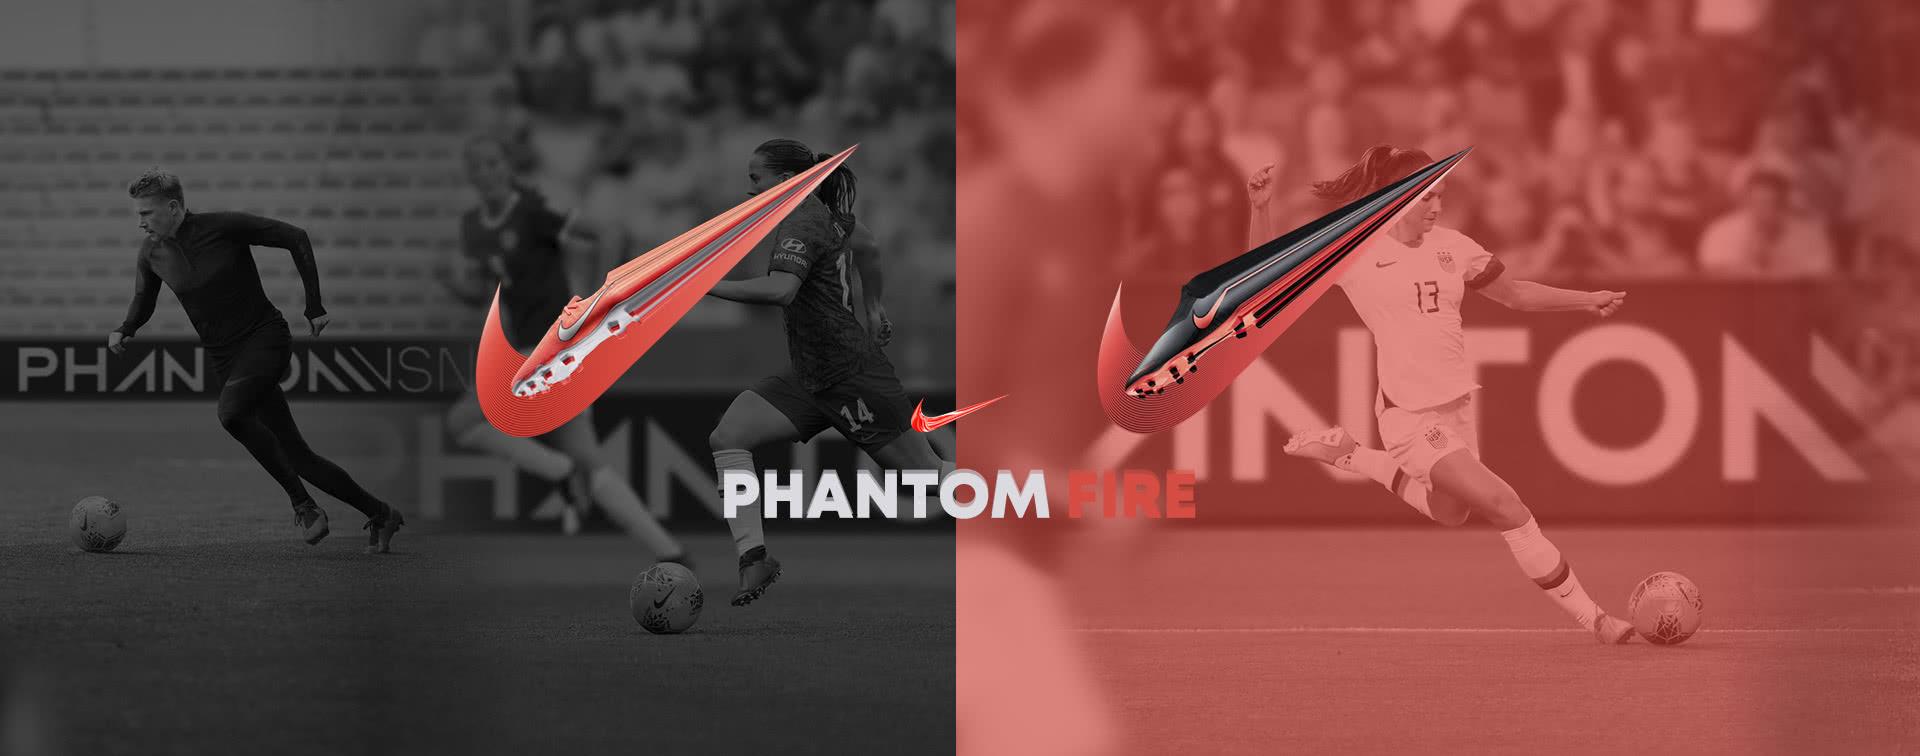 Chaussures Nike Phantom Fire